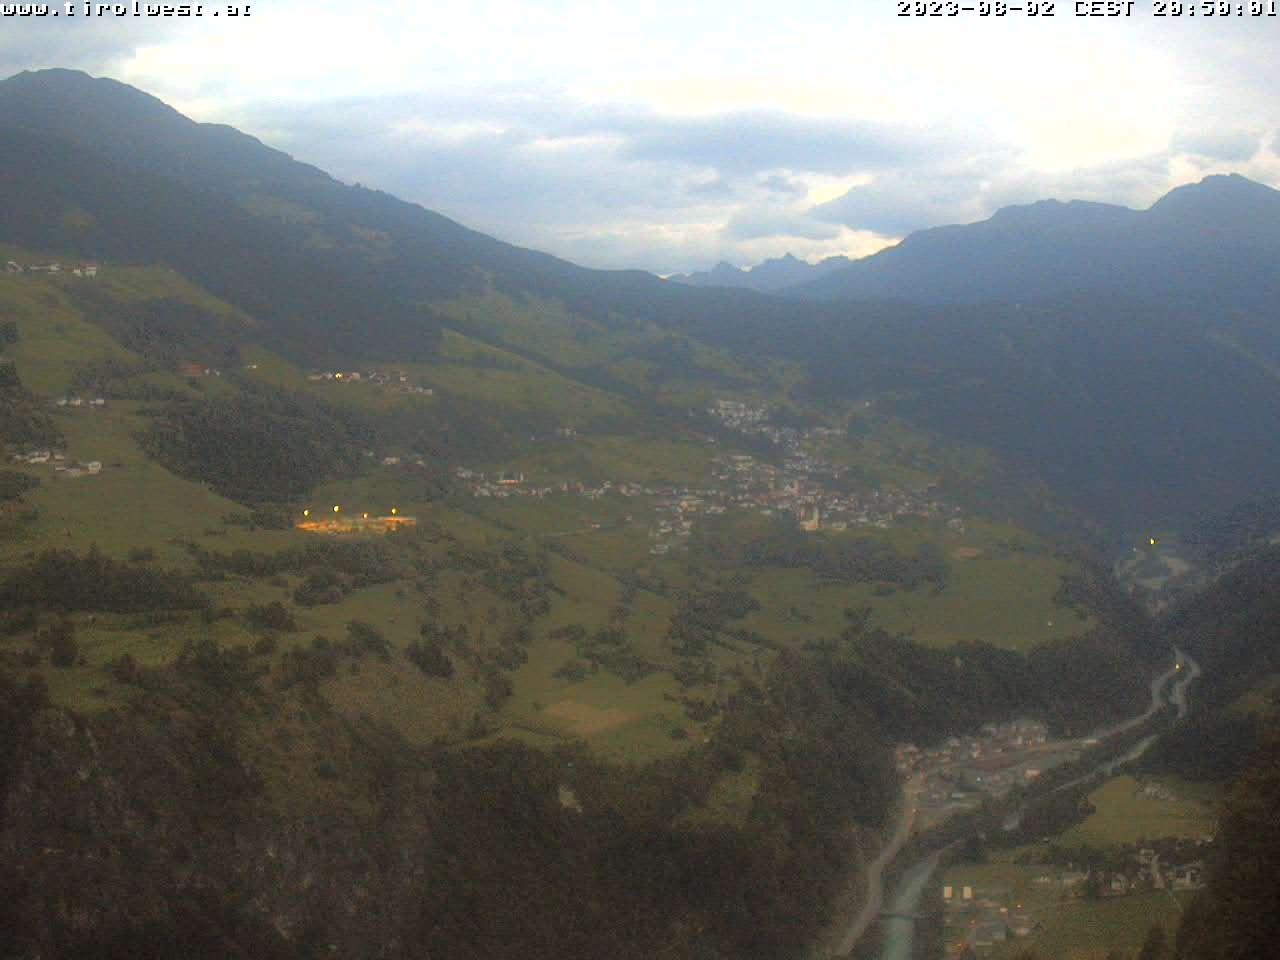 Webcam Hochgallmigg Richtung Fließ (c) TVB Tirol West/Gasthof Alpenrose